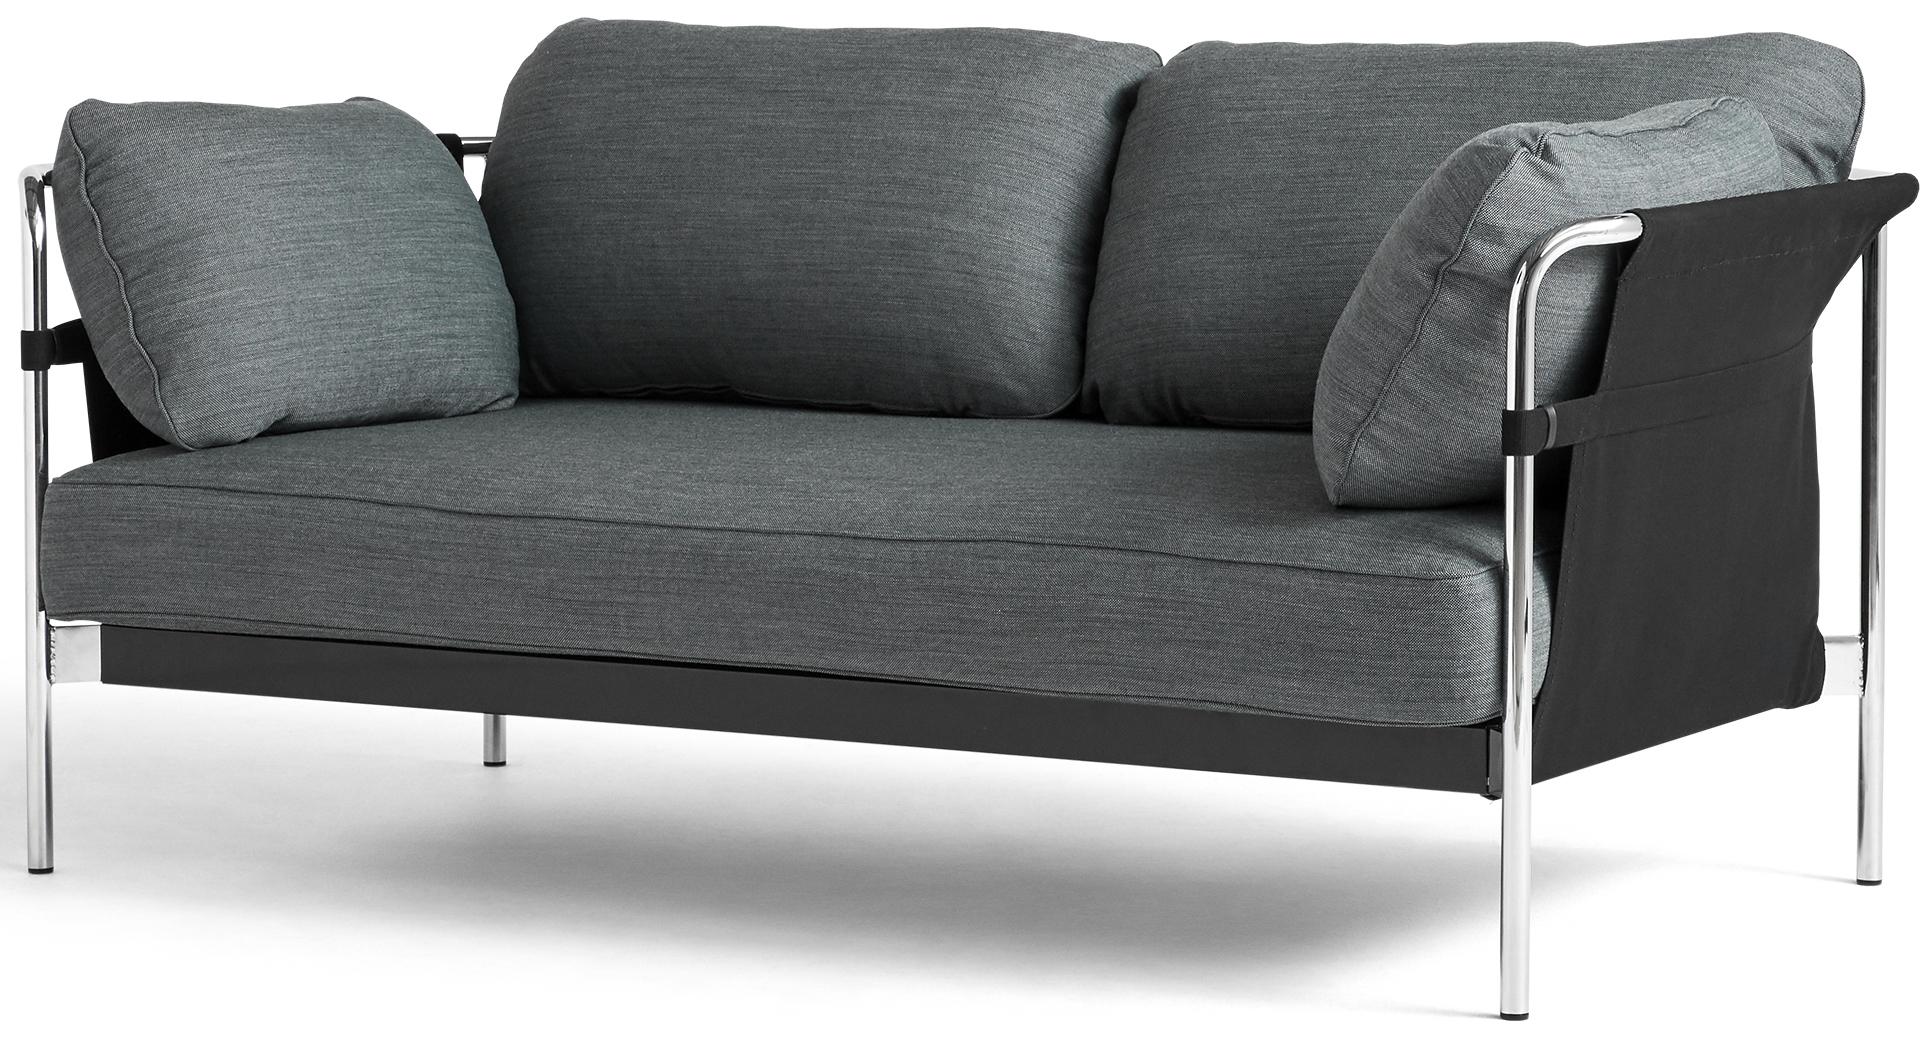 Hay Can sofas & armchair Ronan & Erwan Bouroullec 2016